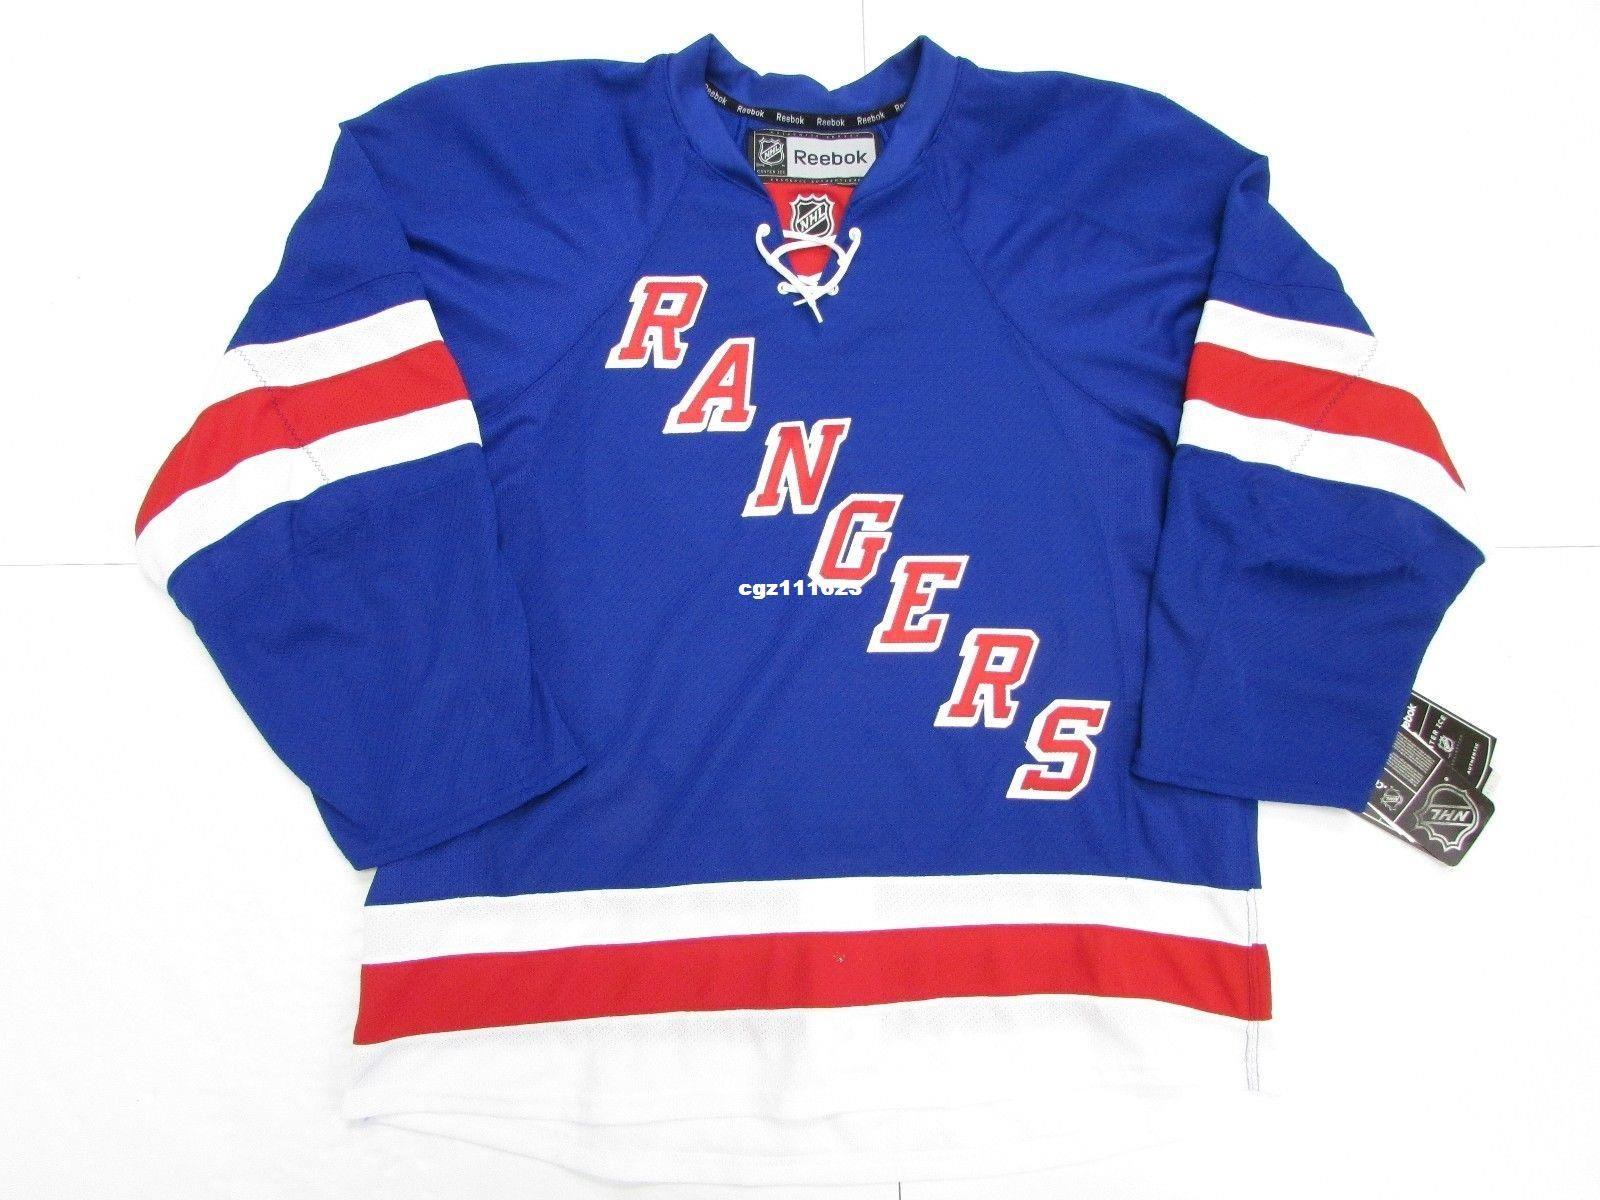 cc83845f971 2019 Cheap Custom NEW YORK RANGERS Blank Ice Hockey Jerseys HOME Stitched HOCKEY  JERSEY From Cgz111623